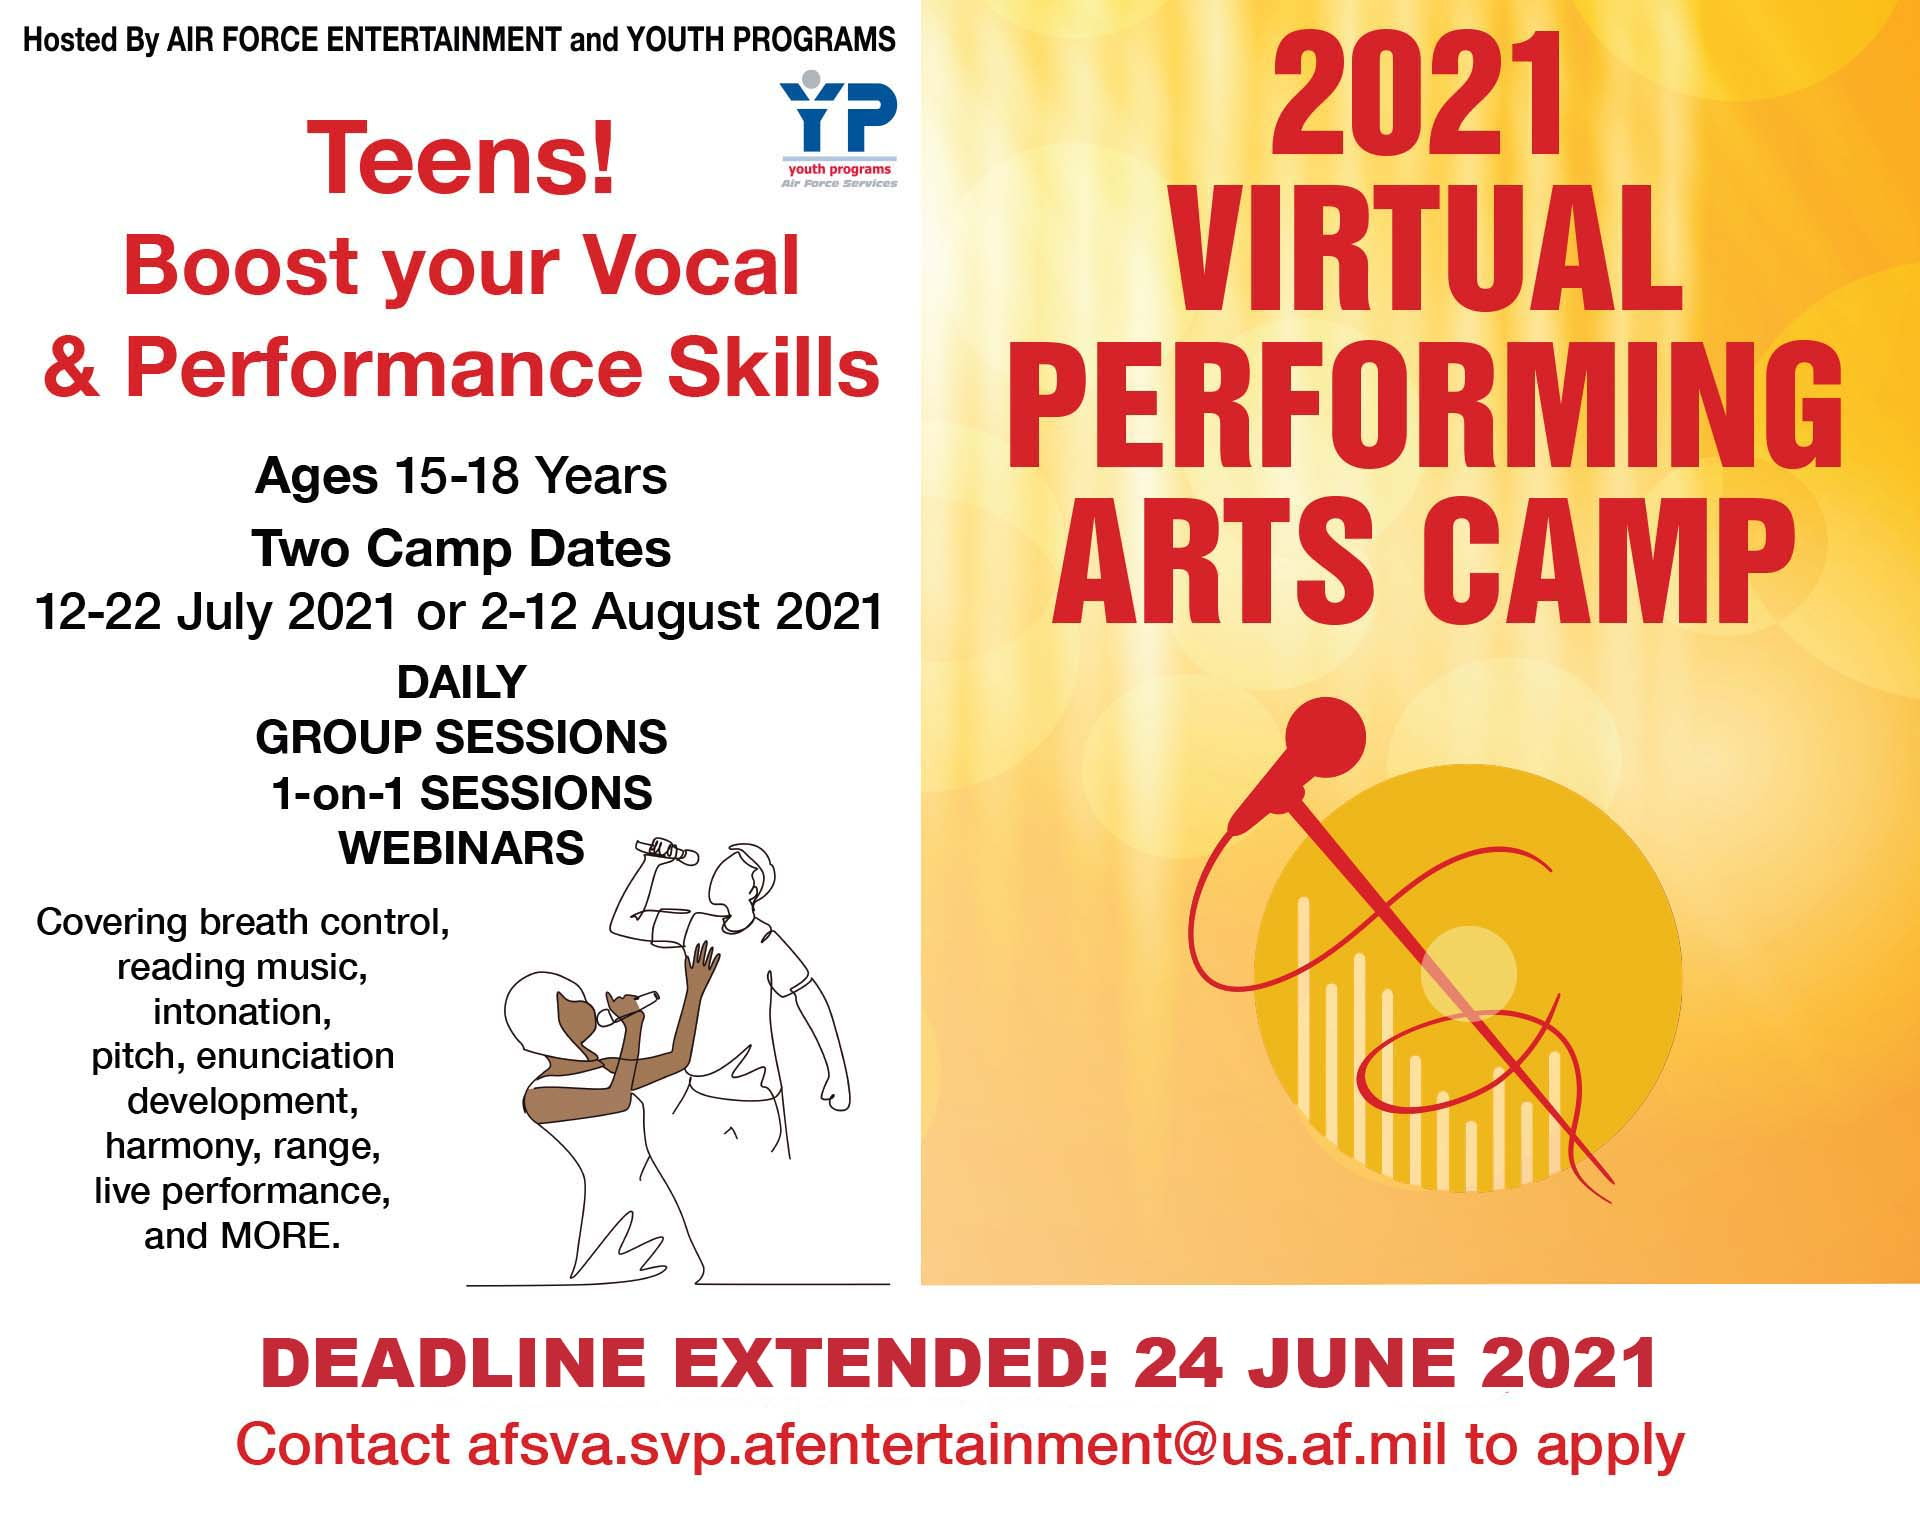 Registration Closes: Virtual Performing Arts Camp